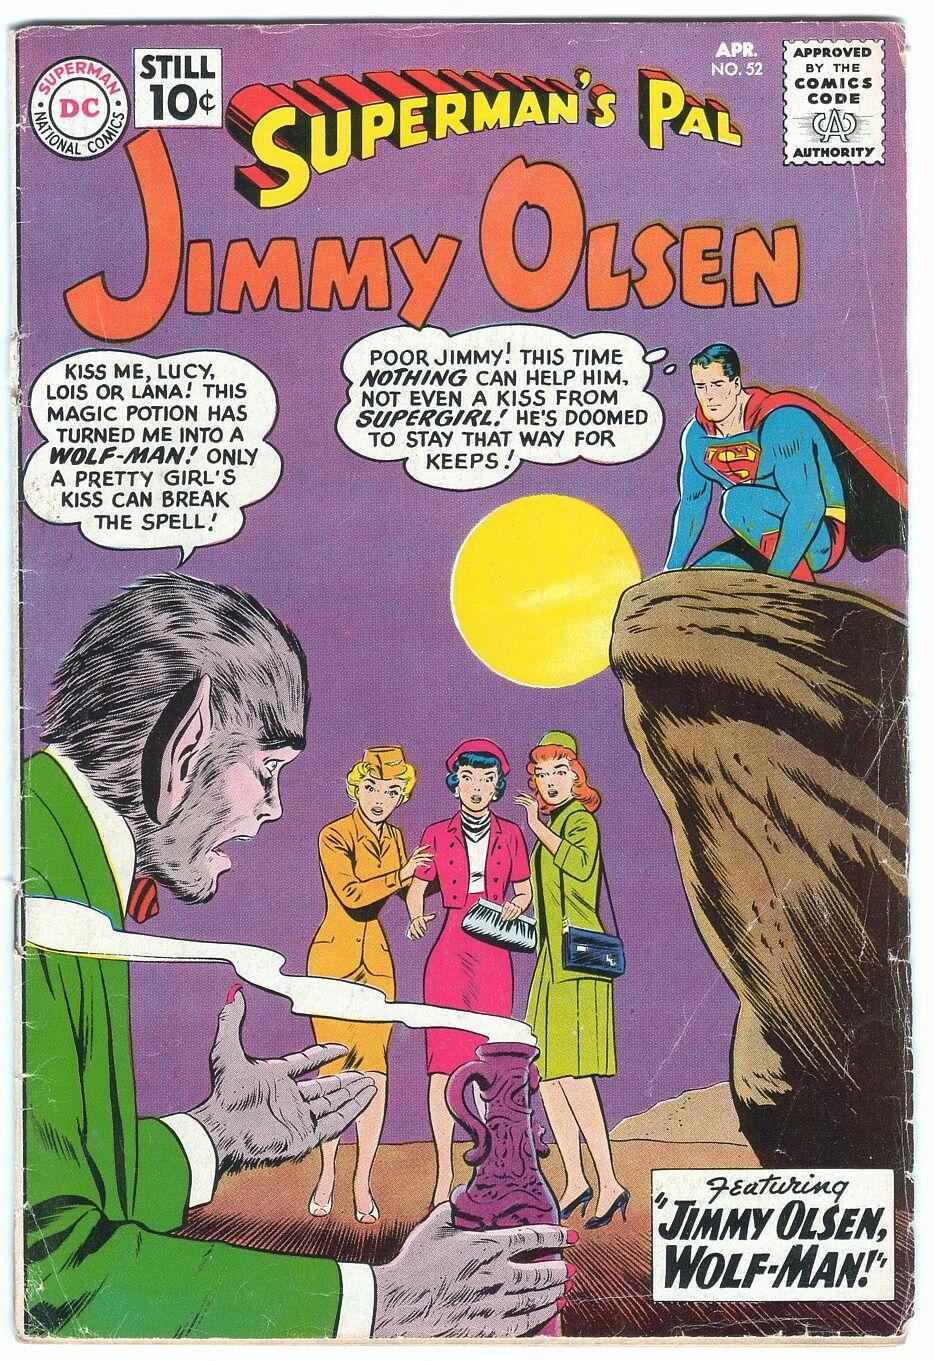 Supermans Pal Jimmy Olsen (1954) 52 Page 1